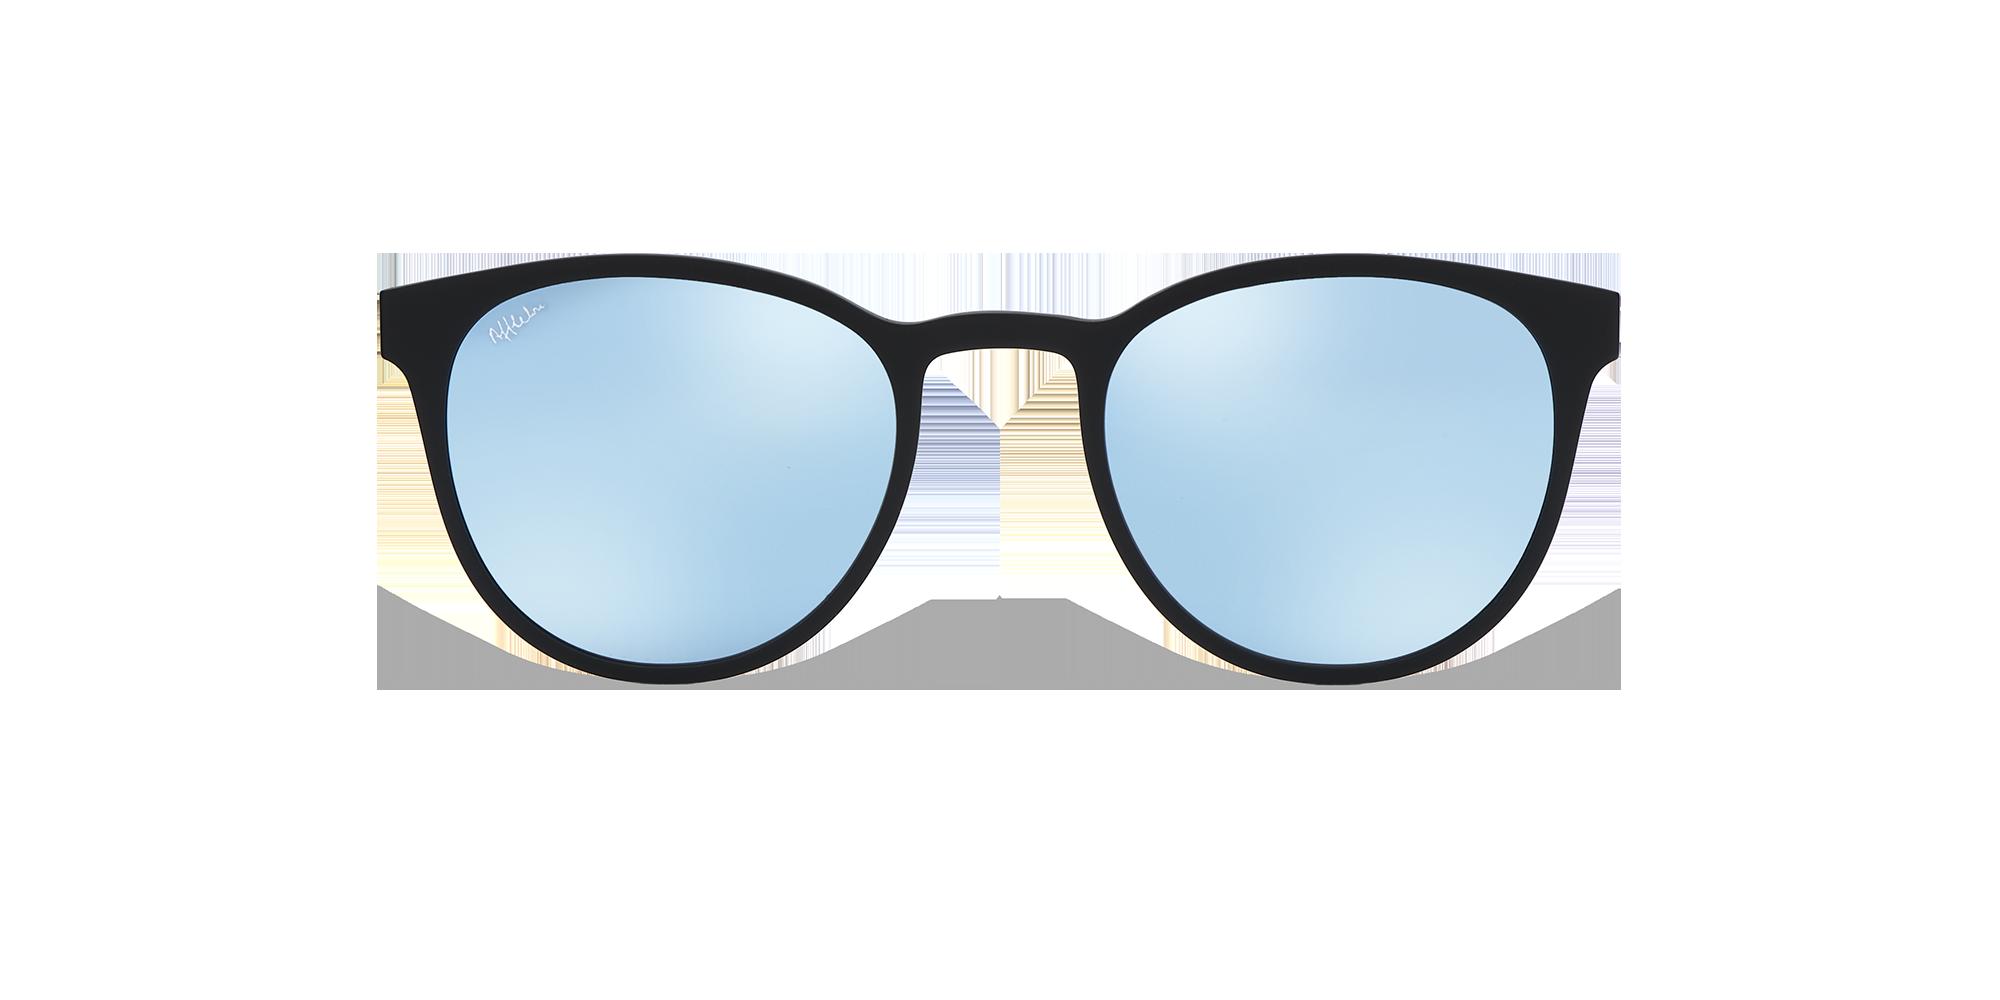 afflelou/france/products/smart_clip/clips_glasses/TMK44S4BK014920.png